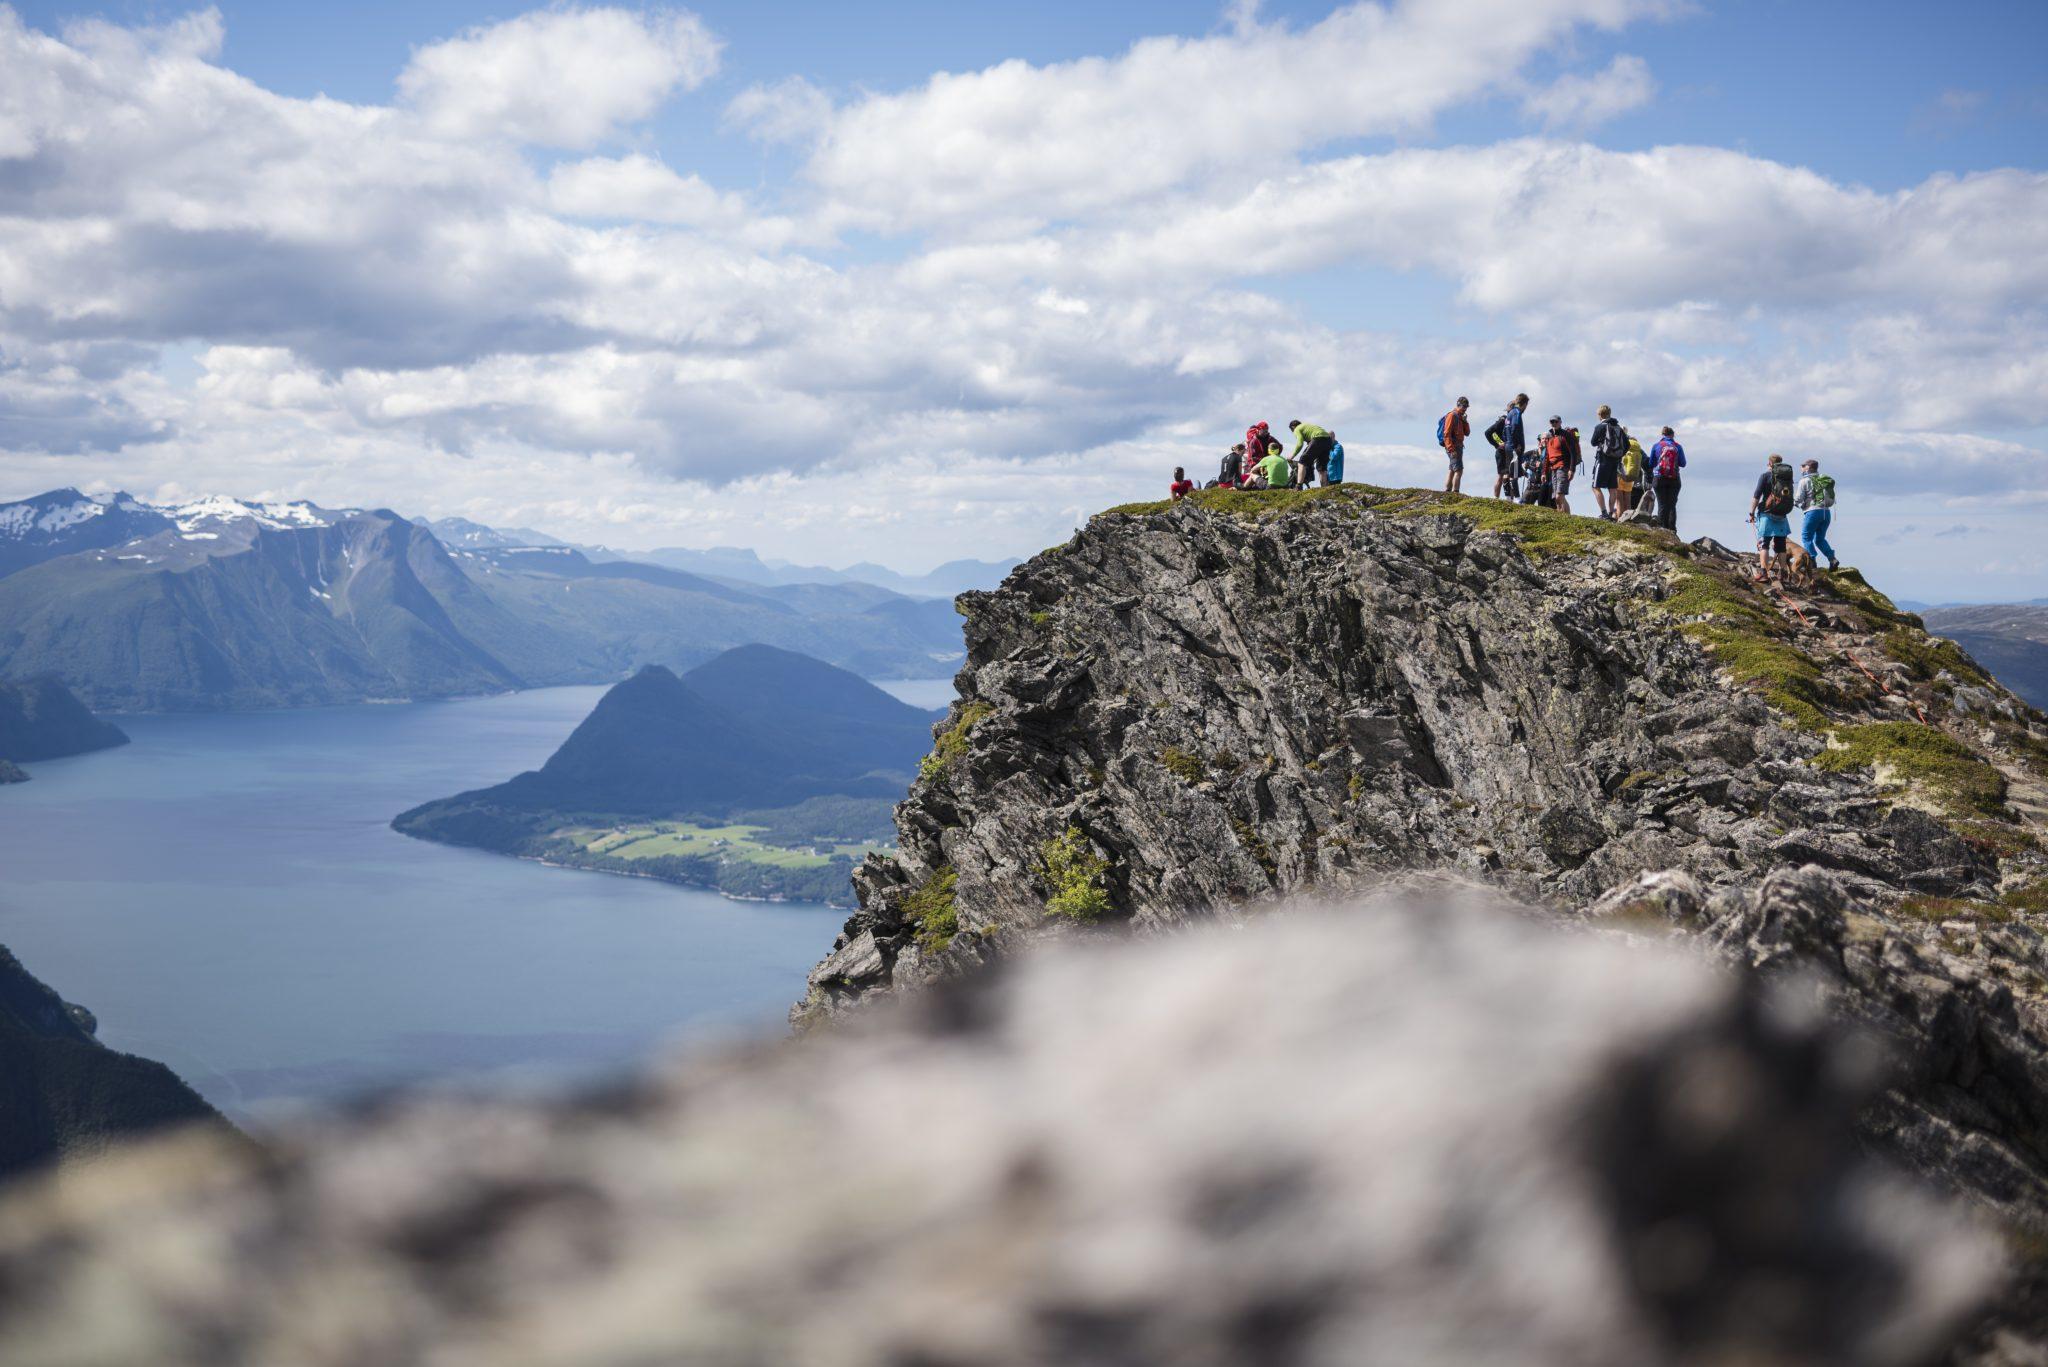 Romsdalseggen under Norsk Fjellfestival 2017. Foto: Tone Molnes